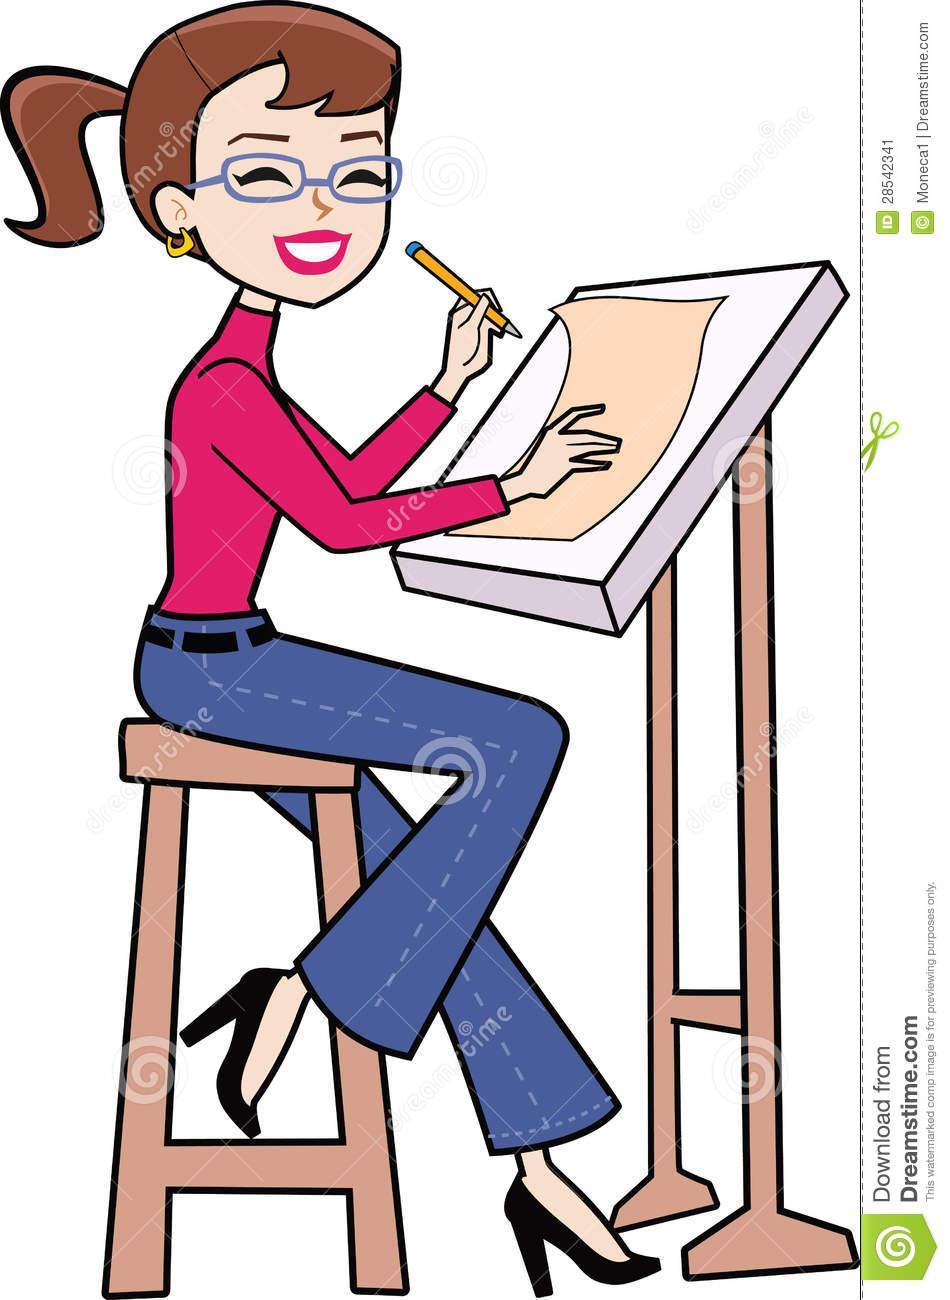 Cartoons To Draw.